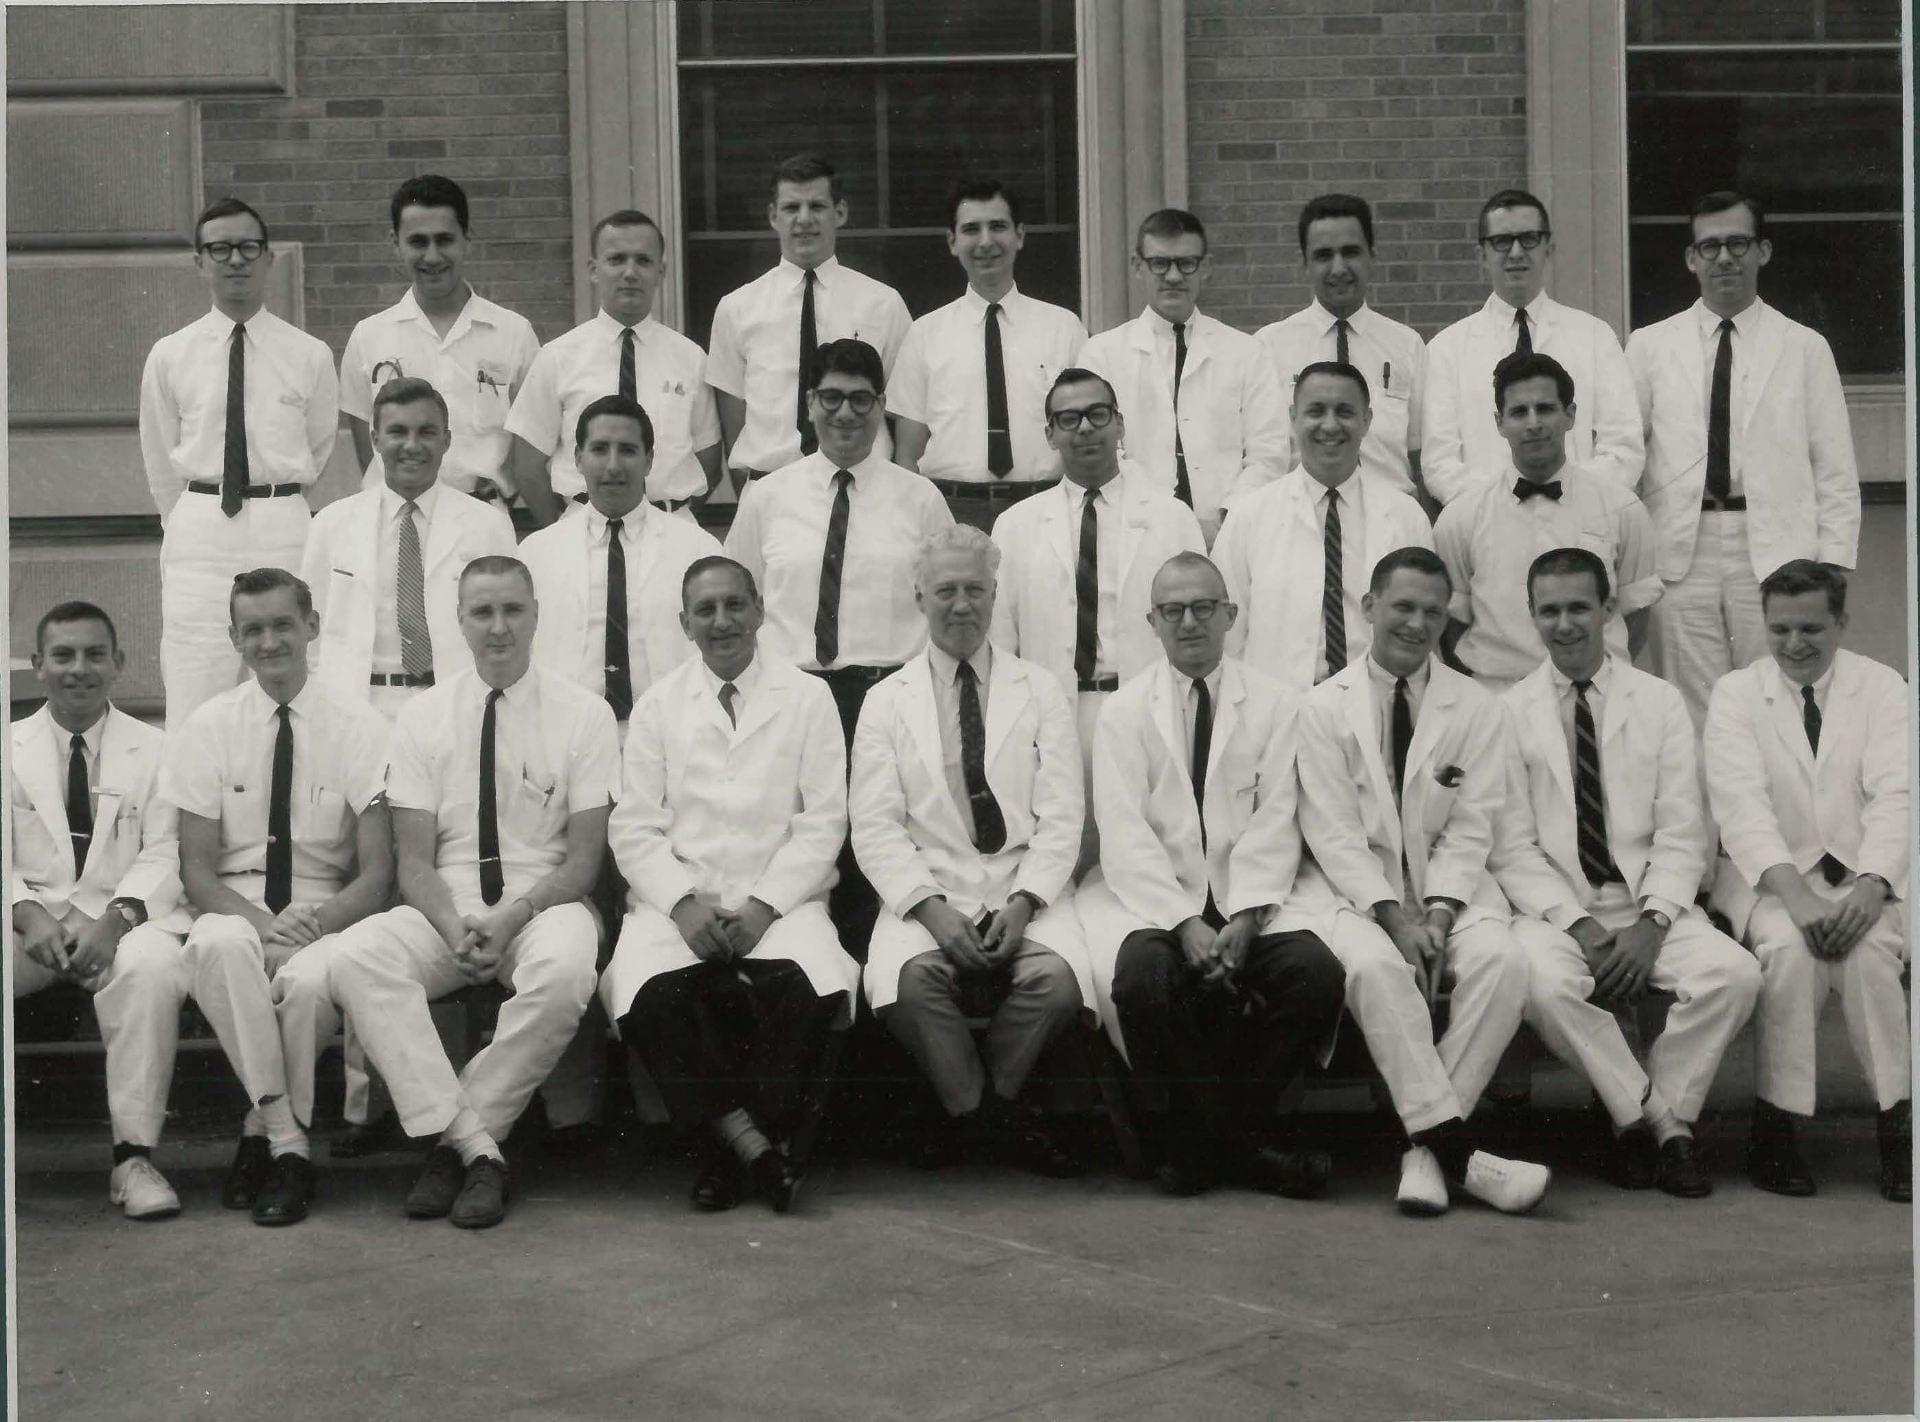 1963 Housestaff Photo (1)